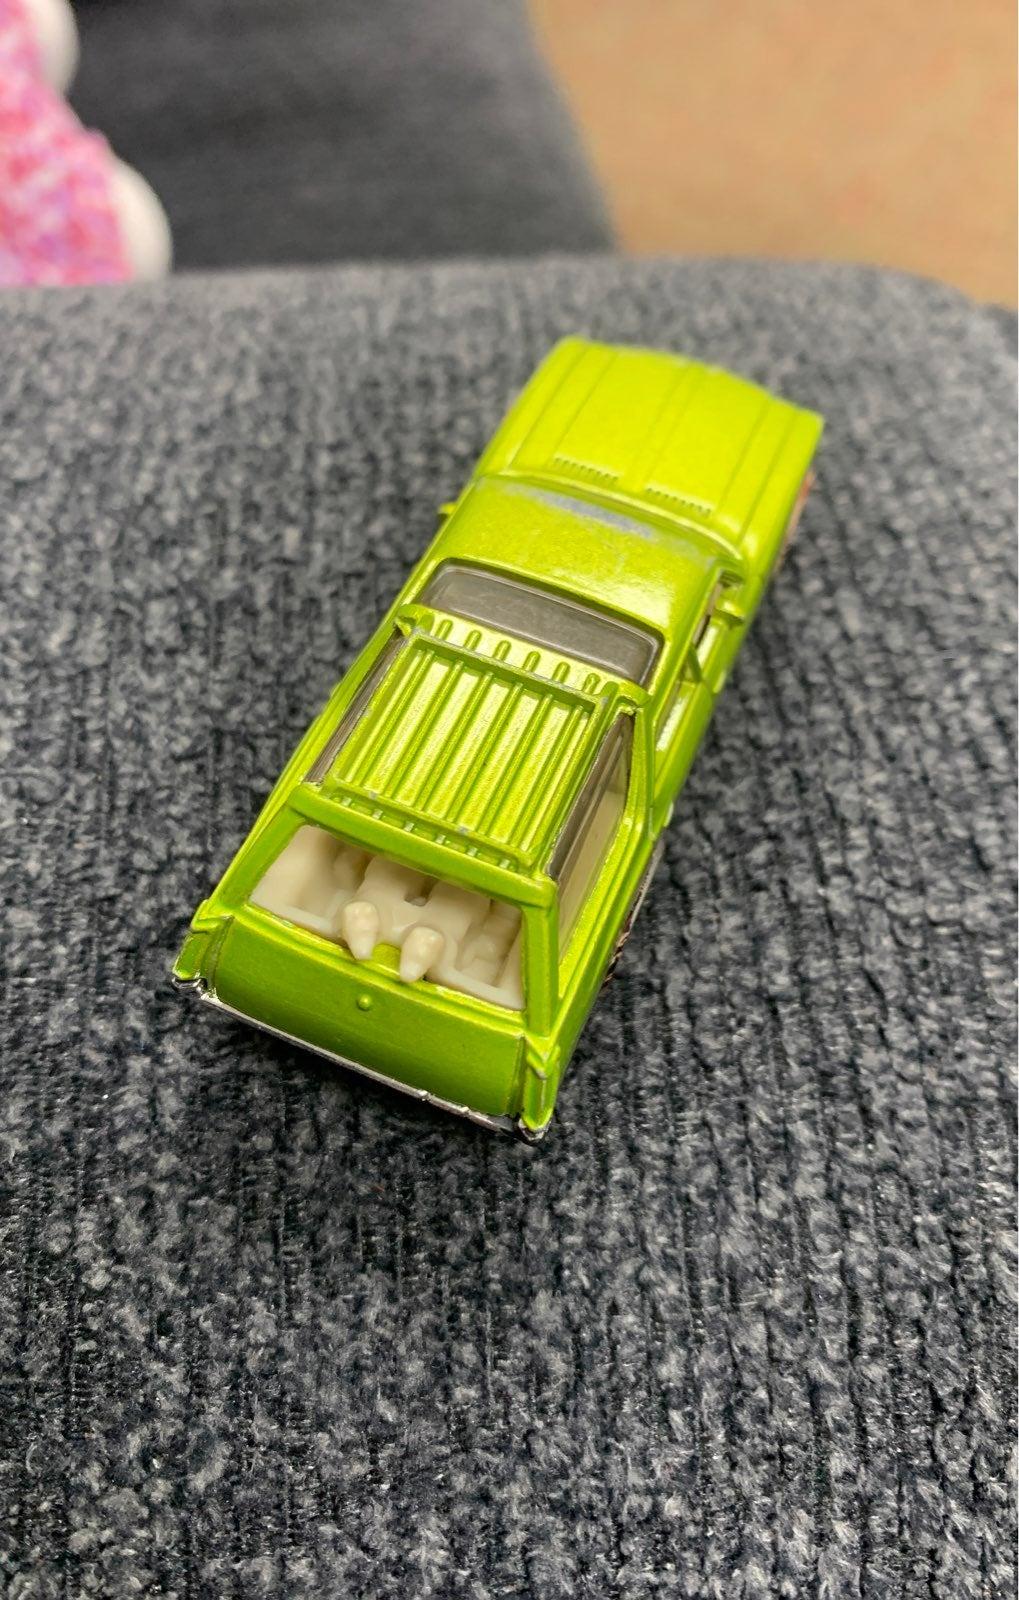 Vintage 1971 Matchbox station wagon